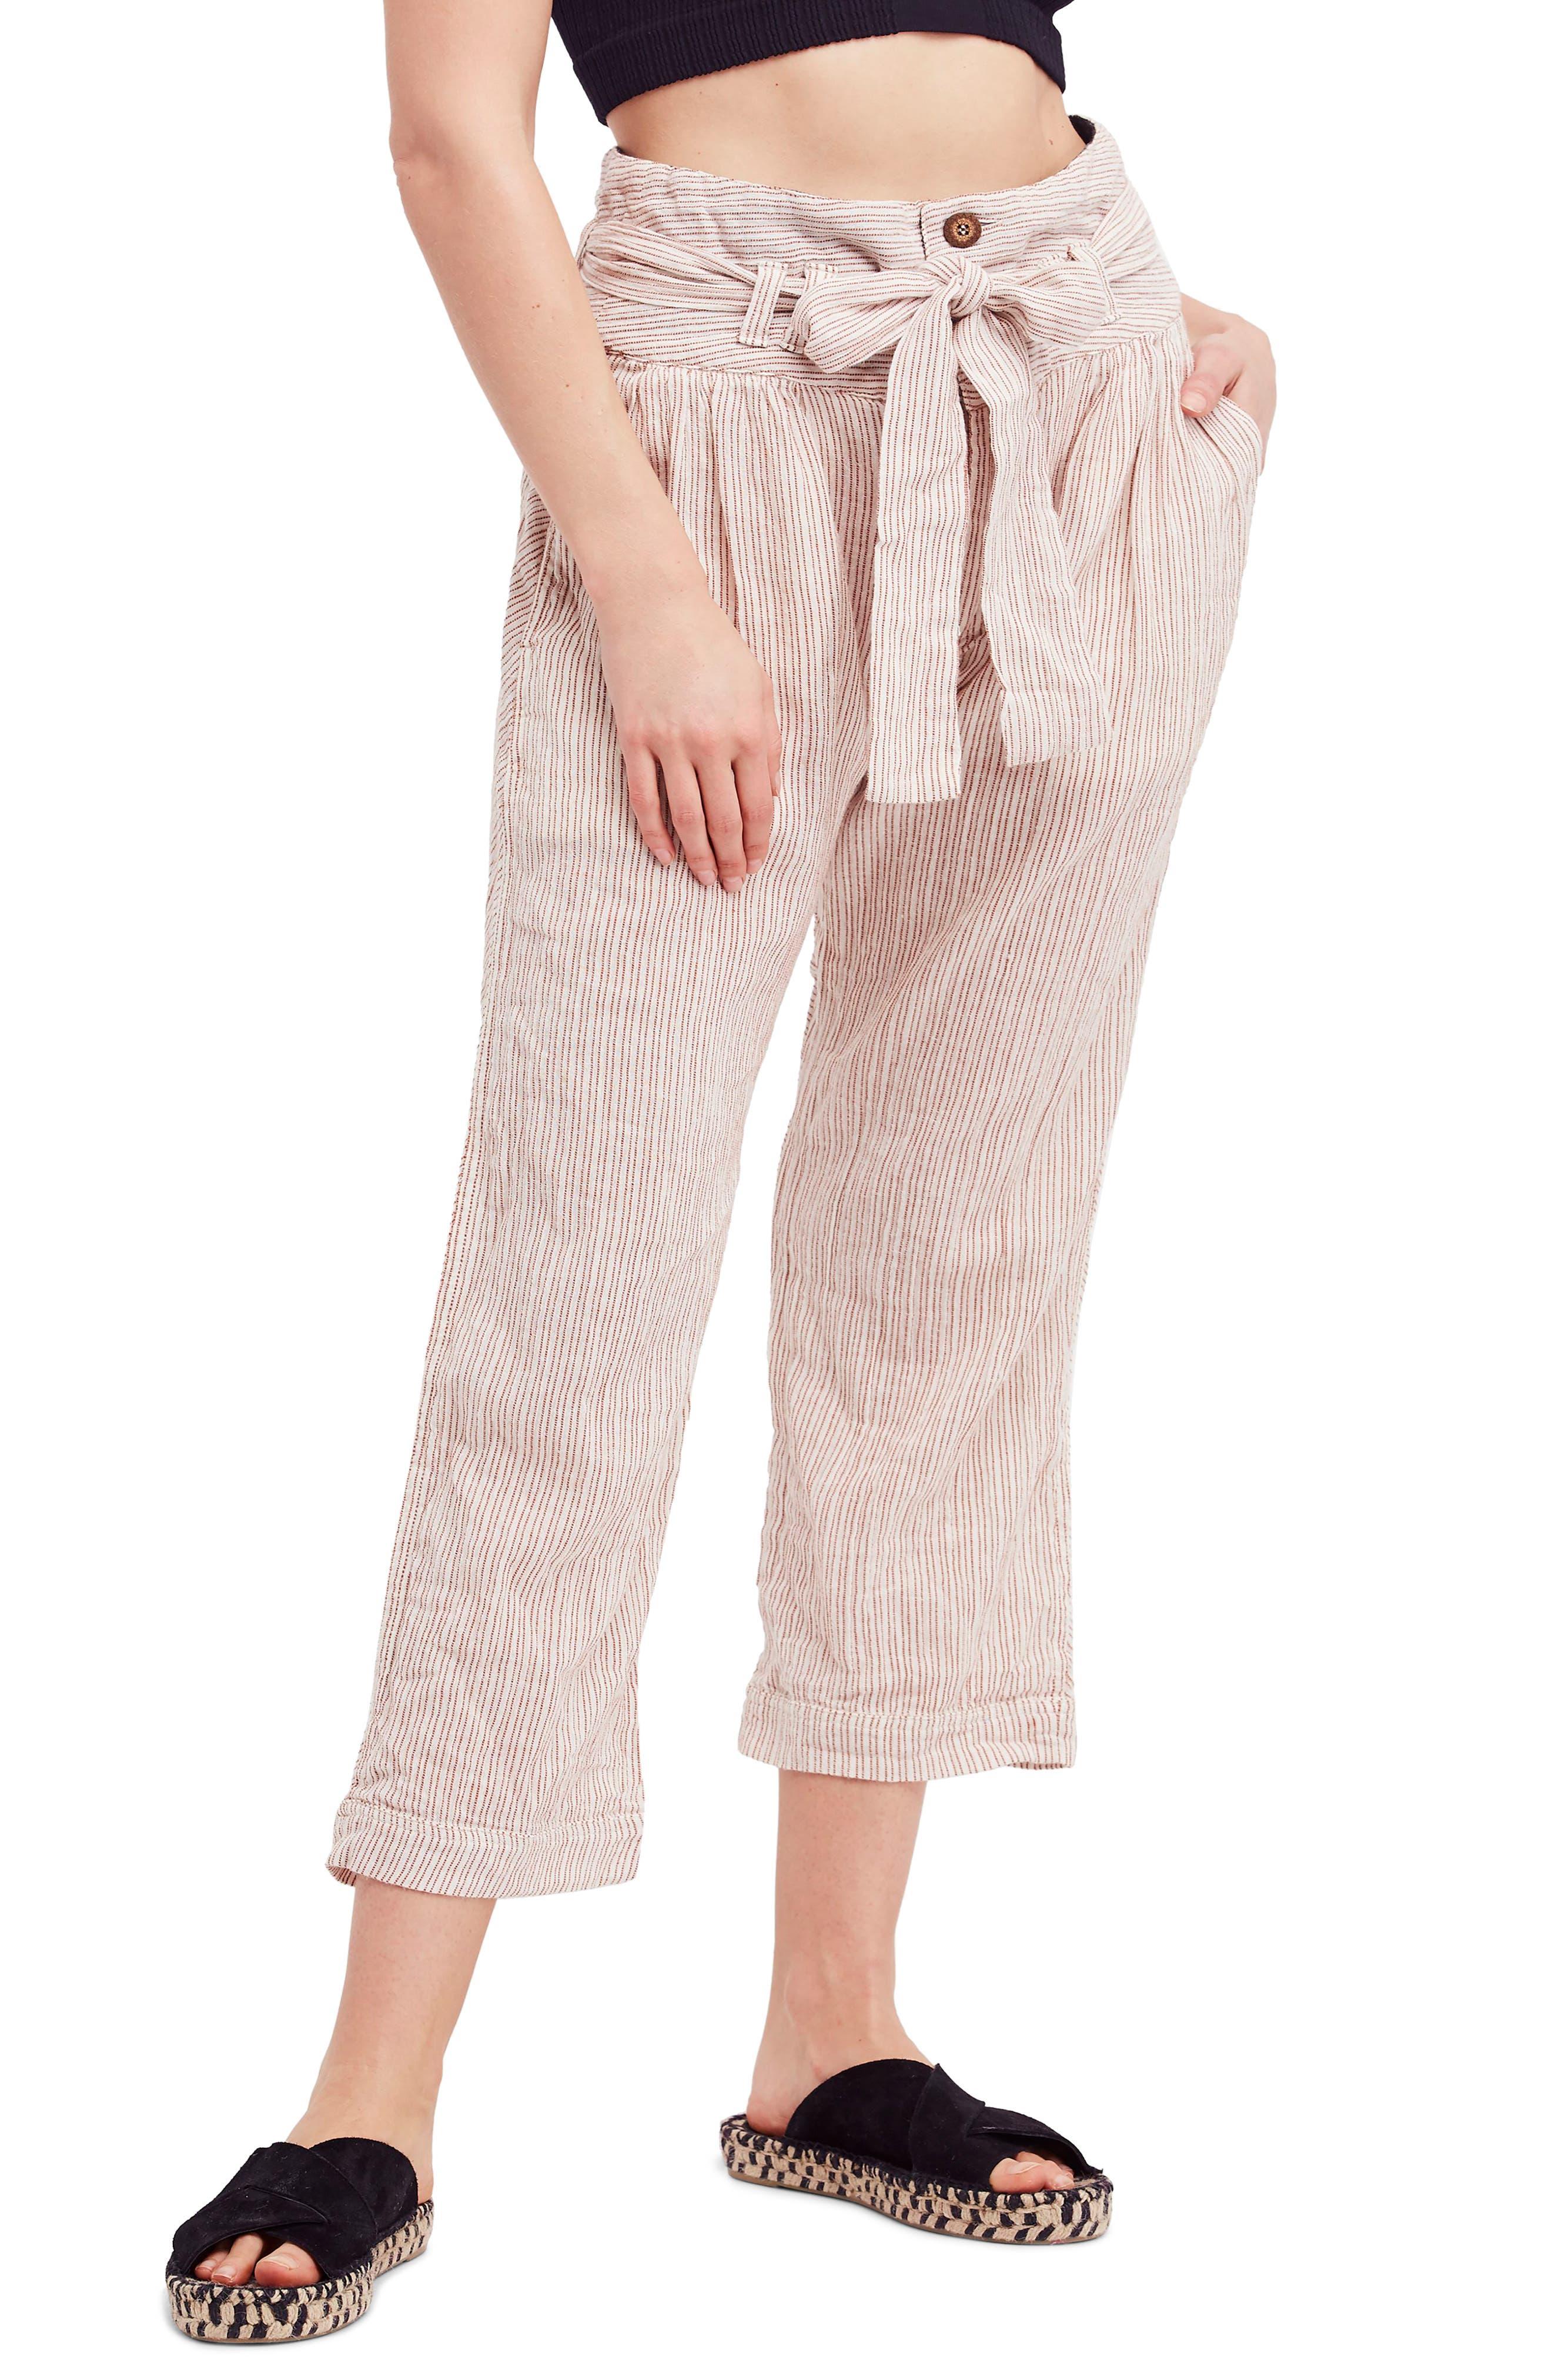 Rumors Crop Pants,                         Main,                         color, Neutral